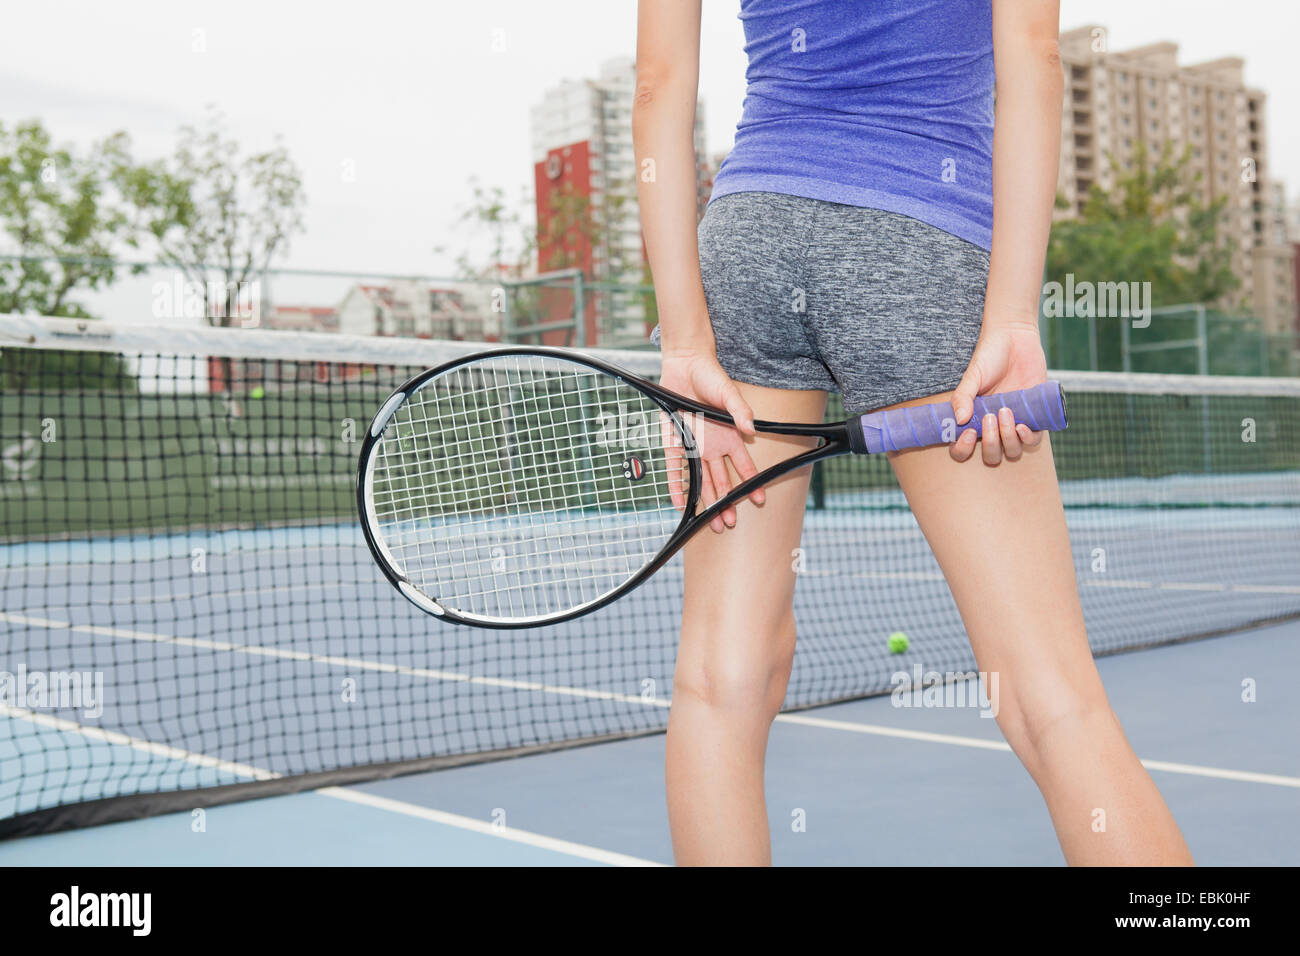 Vista trasera recortada del joven jugador de tenis en la cancha de tenis Imagen De Stock